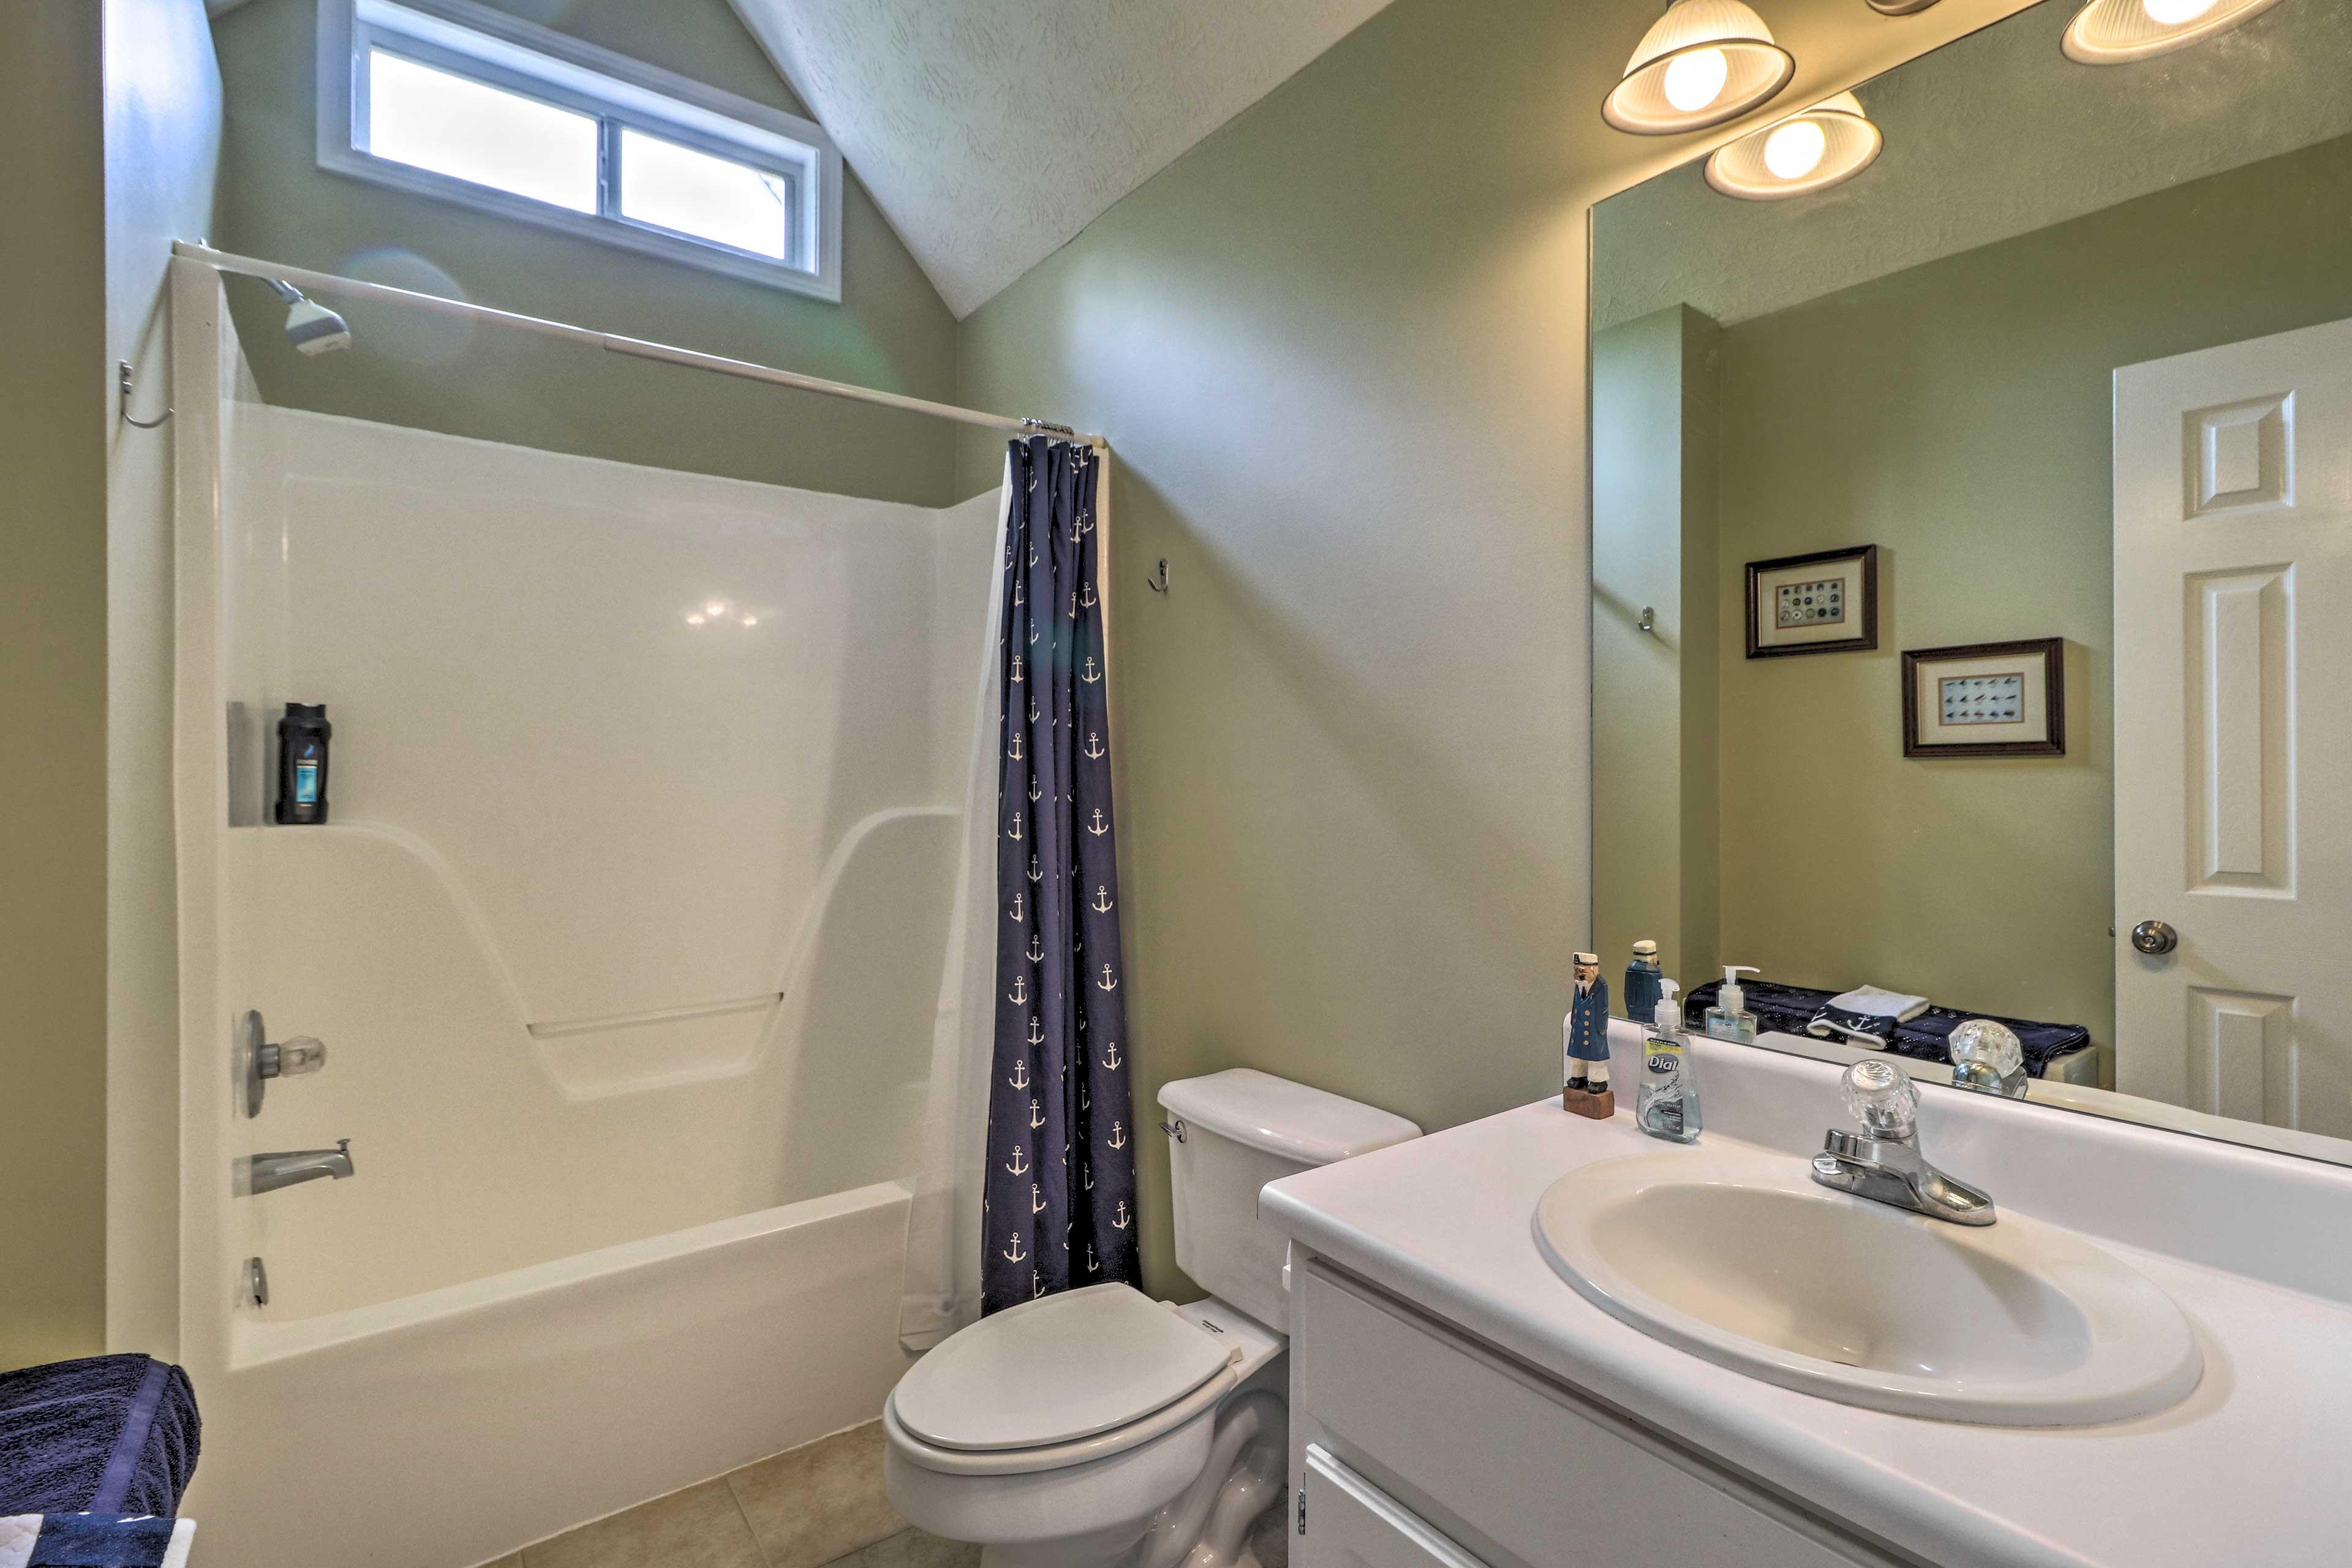 Bathroom | Shower/Tub Combo